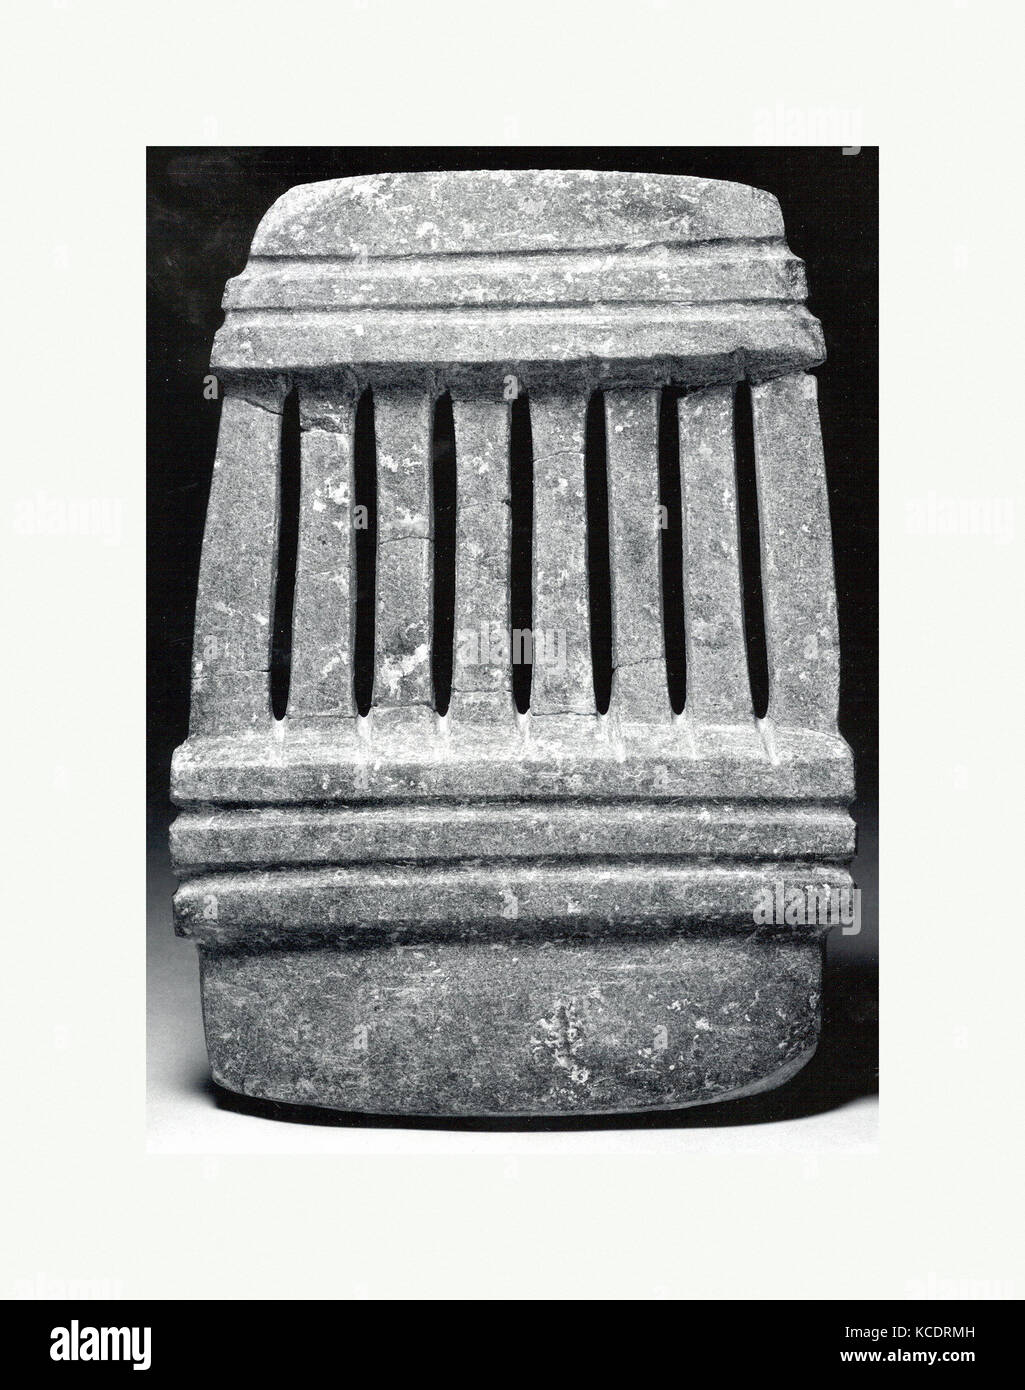 Temple Model, 1st–8th century, Mexico, Mesoamerica, Guerrero, Balsas River region, Mezcala, Stone, H. 8 1/4 x W. - Stock Image